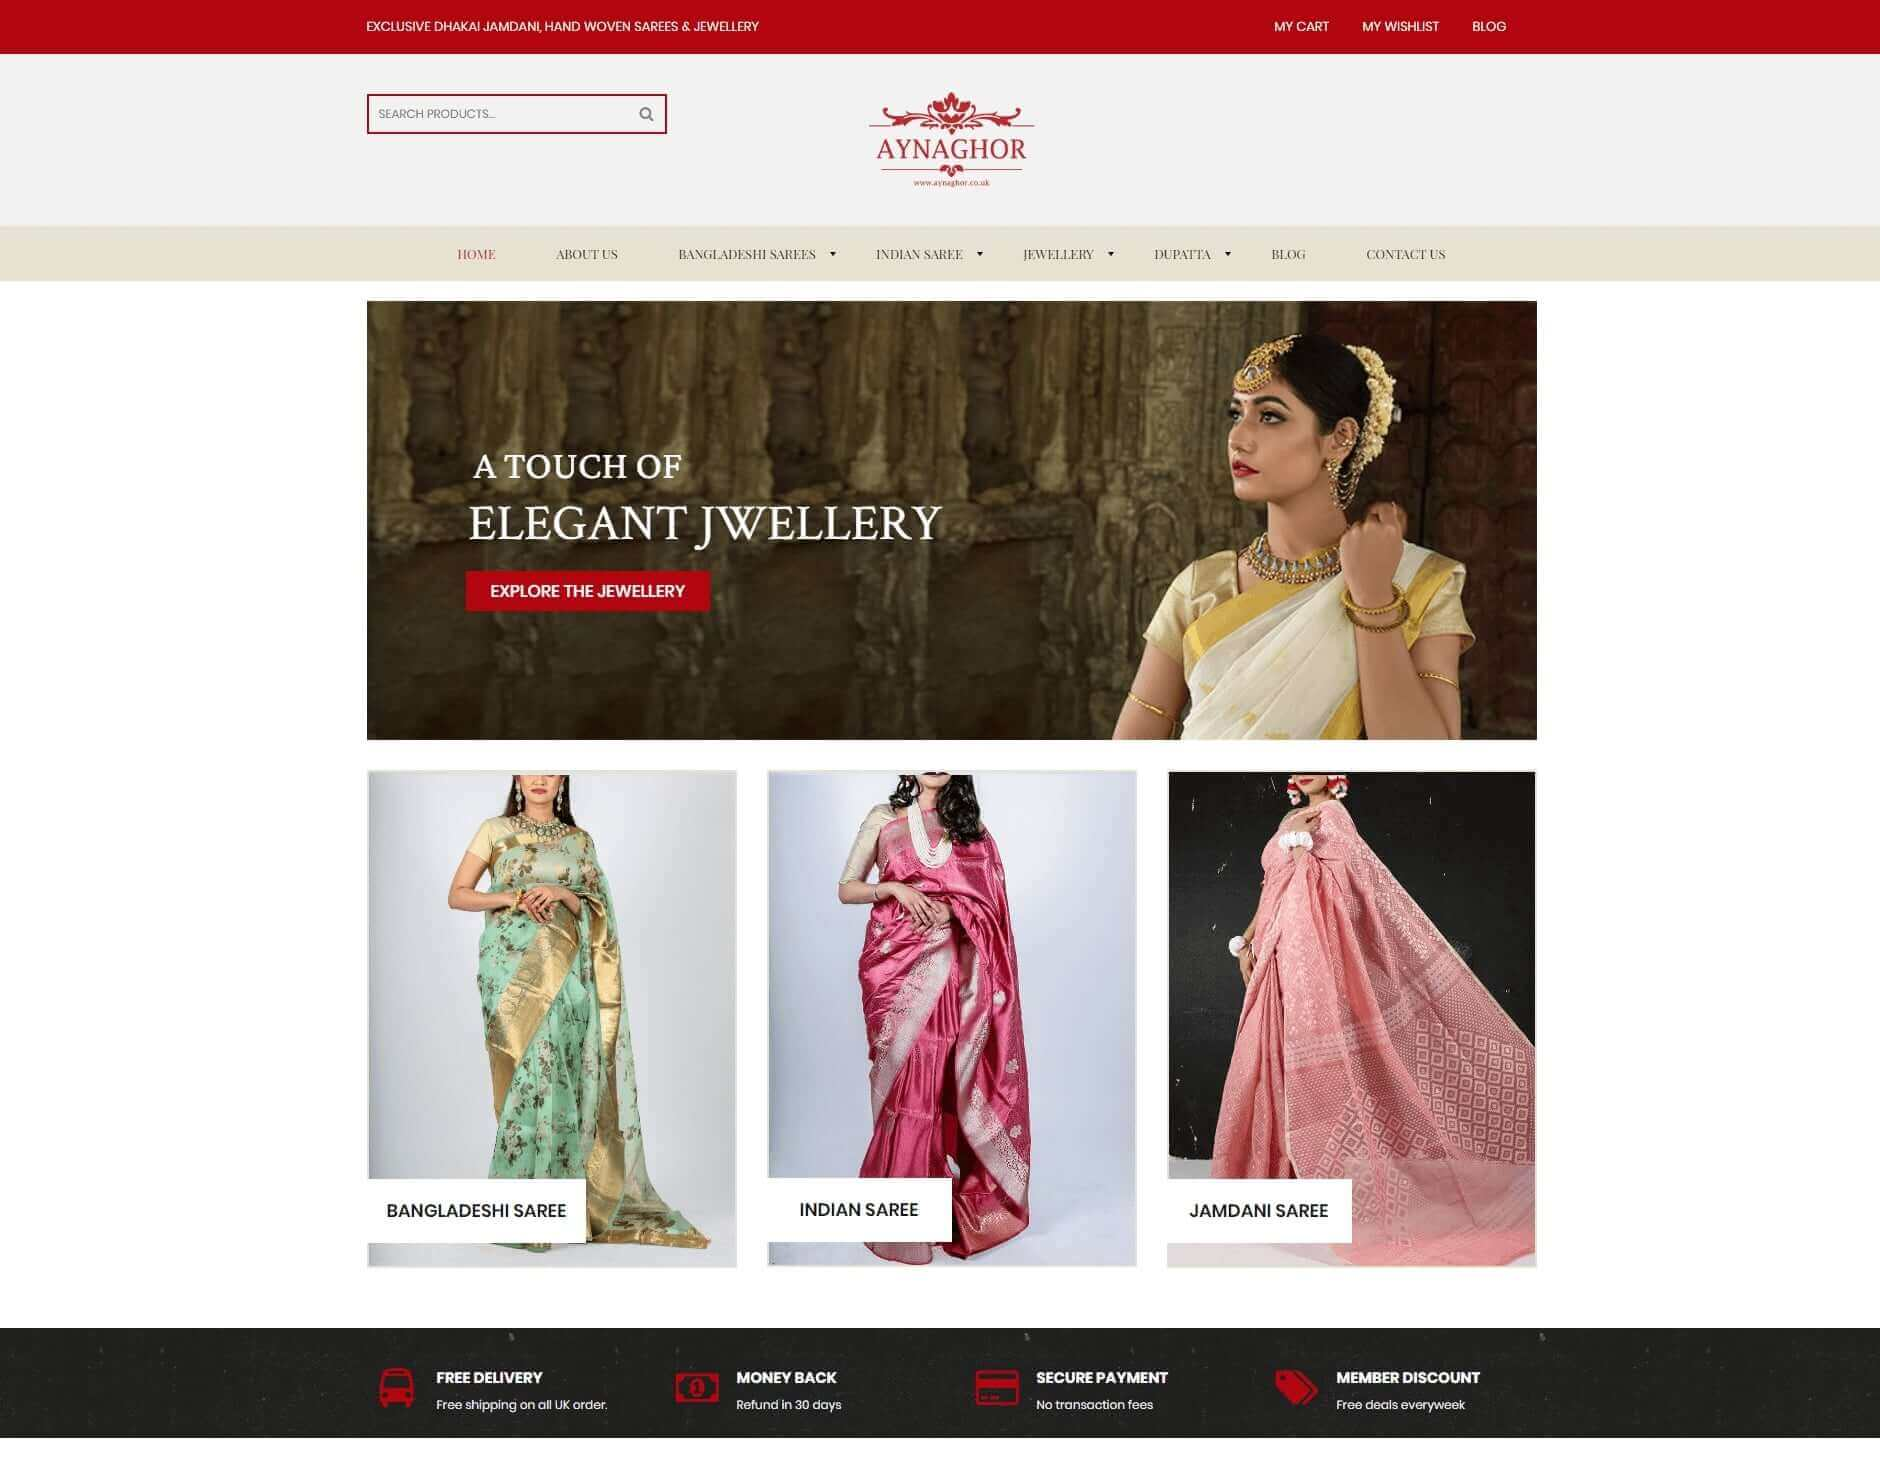 Aynaghor uk website development